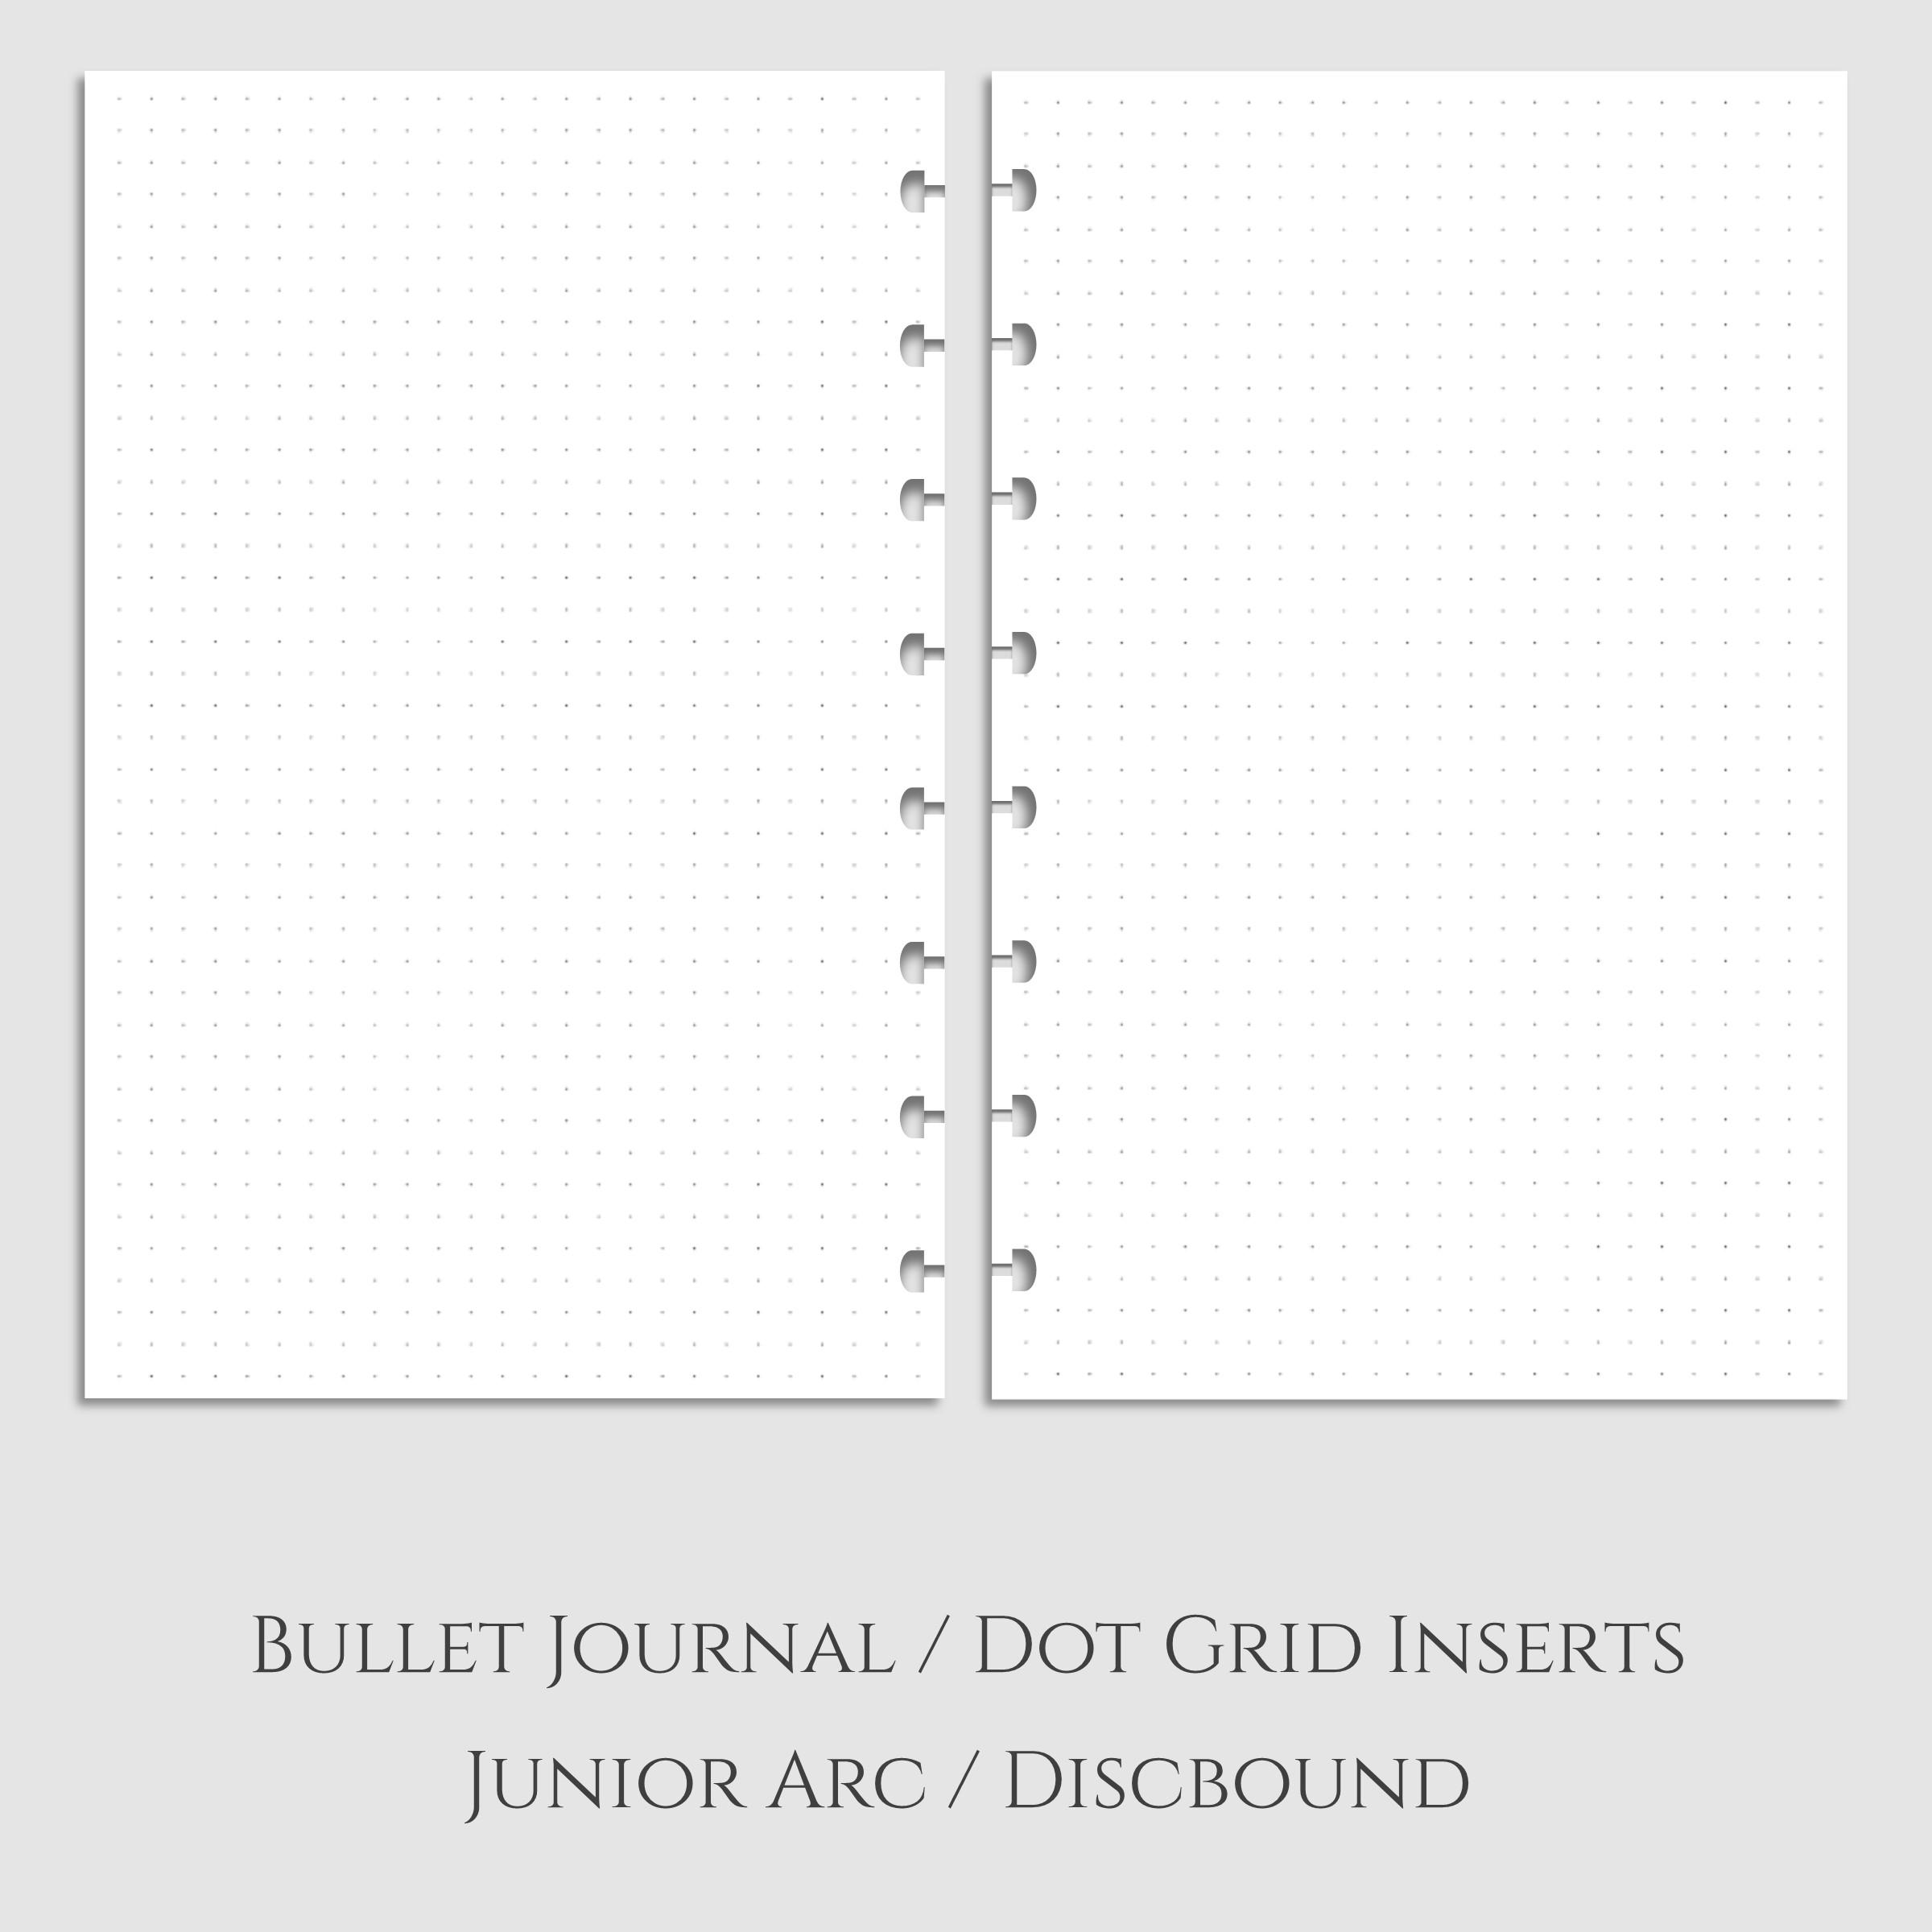 Bullet Journal Dot Grid Discbound Inserts